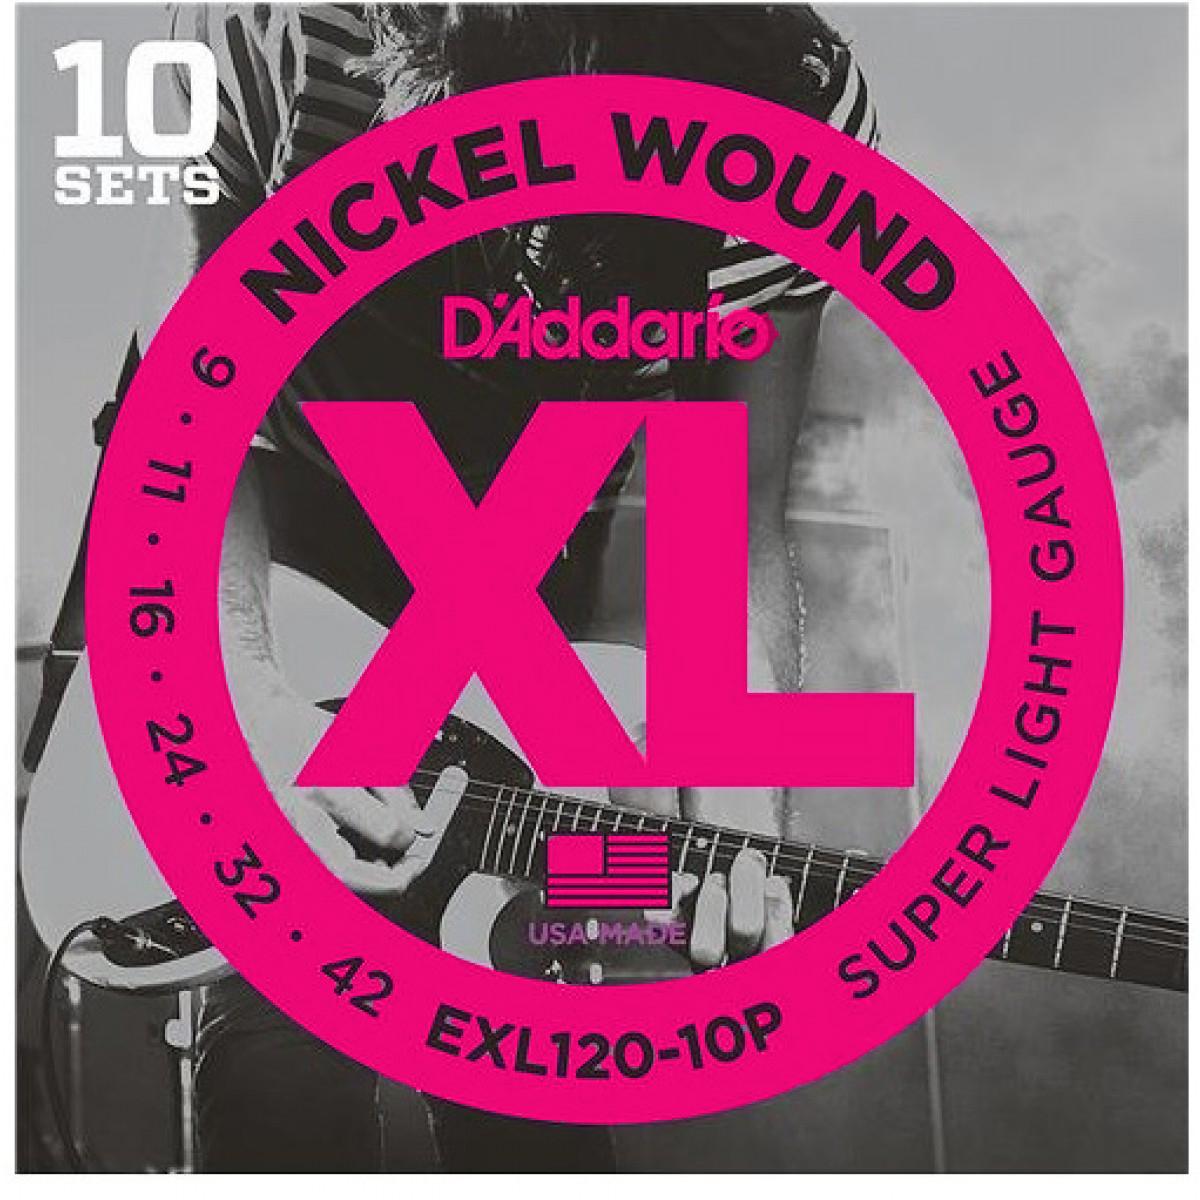 D'Addario EXL120-10P Nickel Super Light Electric Guitar Strings 1-Pack